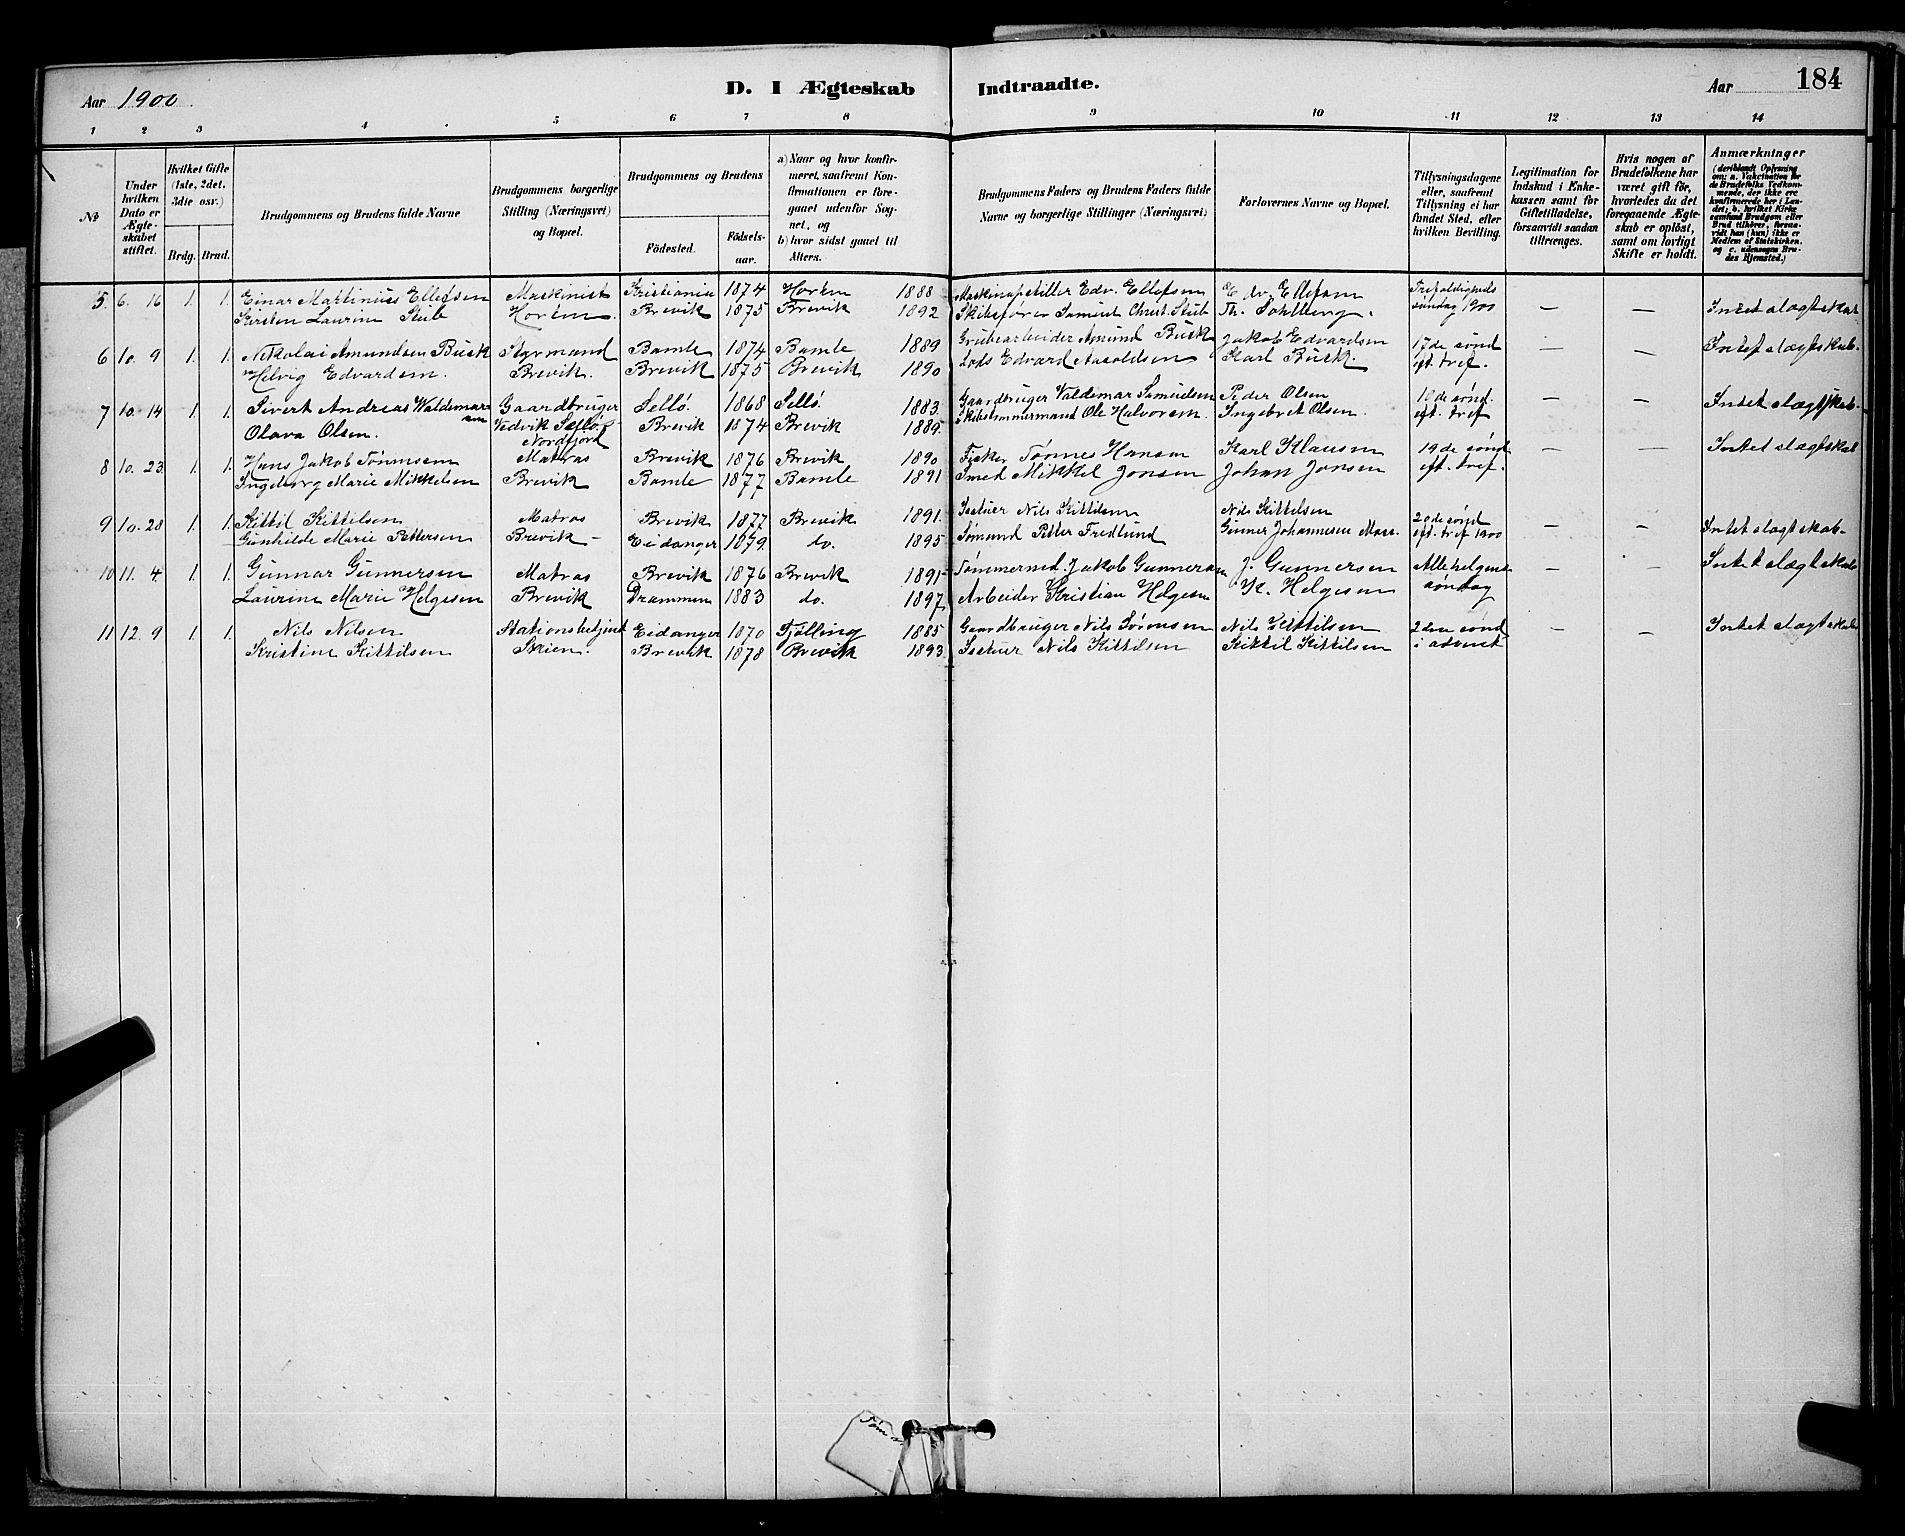 SAKO, Brevik kirkebøker, G/Ga/L0004: Klokkerbok nr. 4, 1882-1900, s. 184